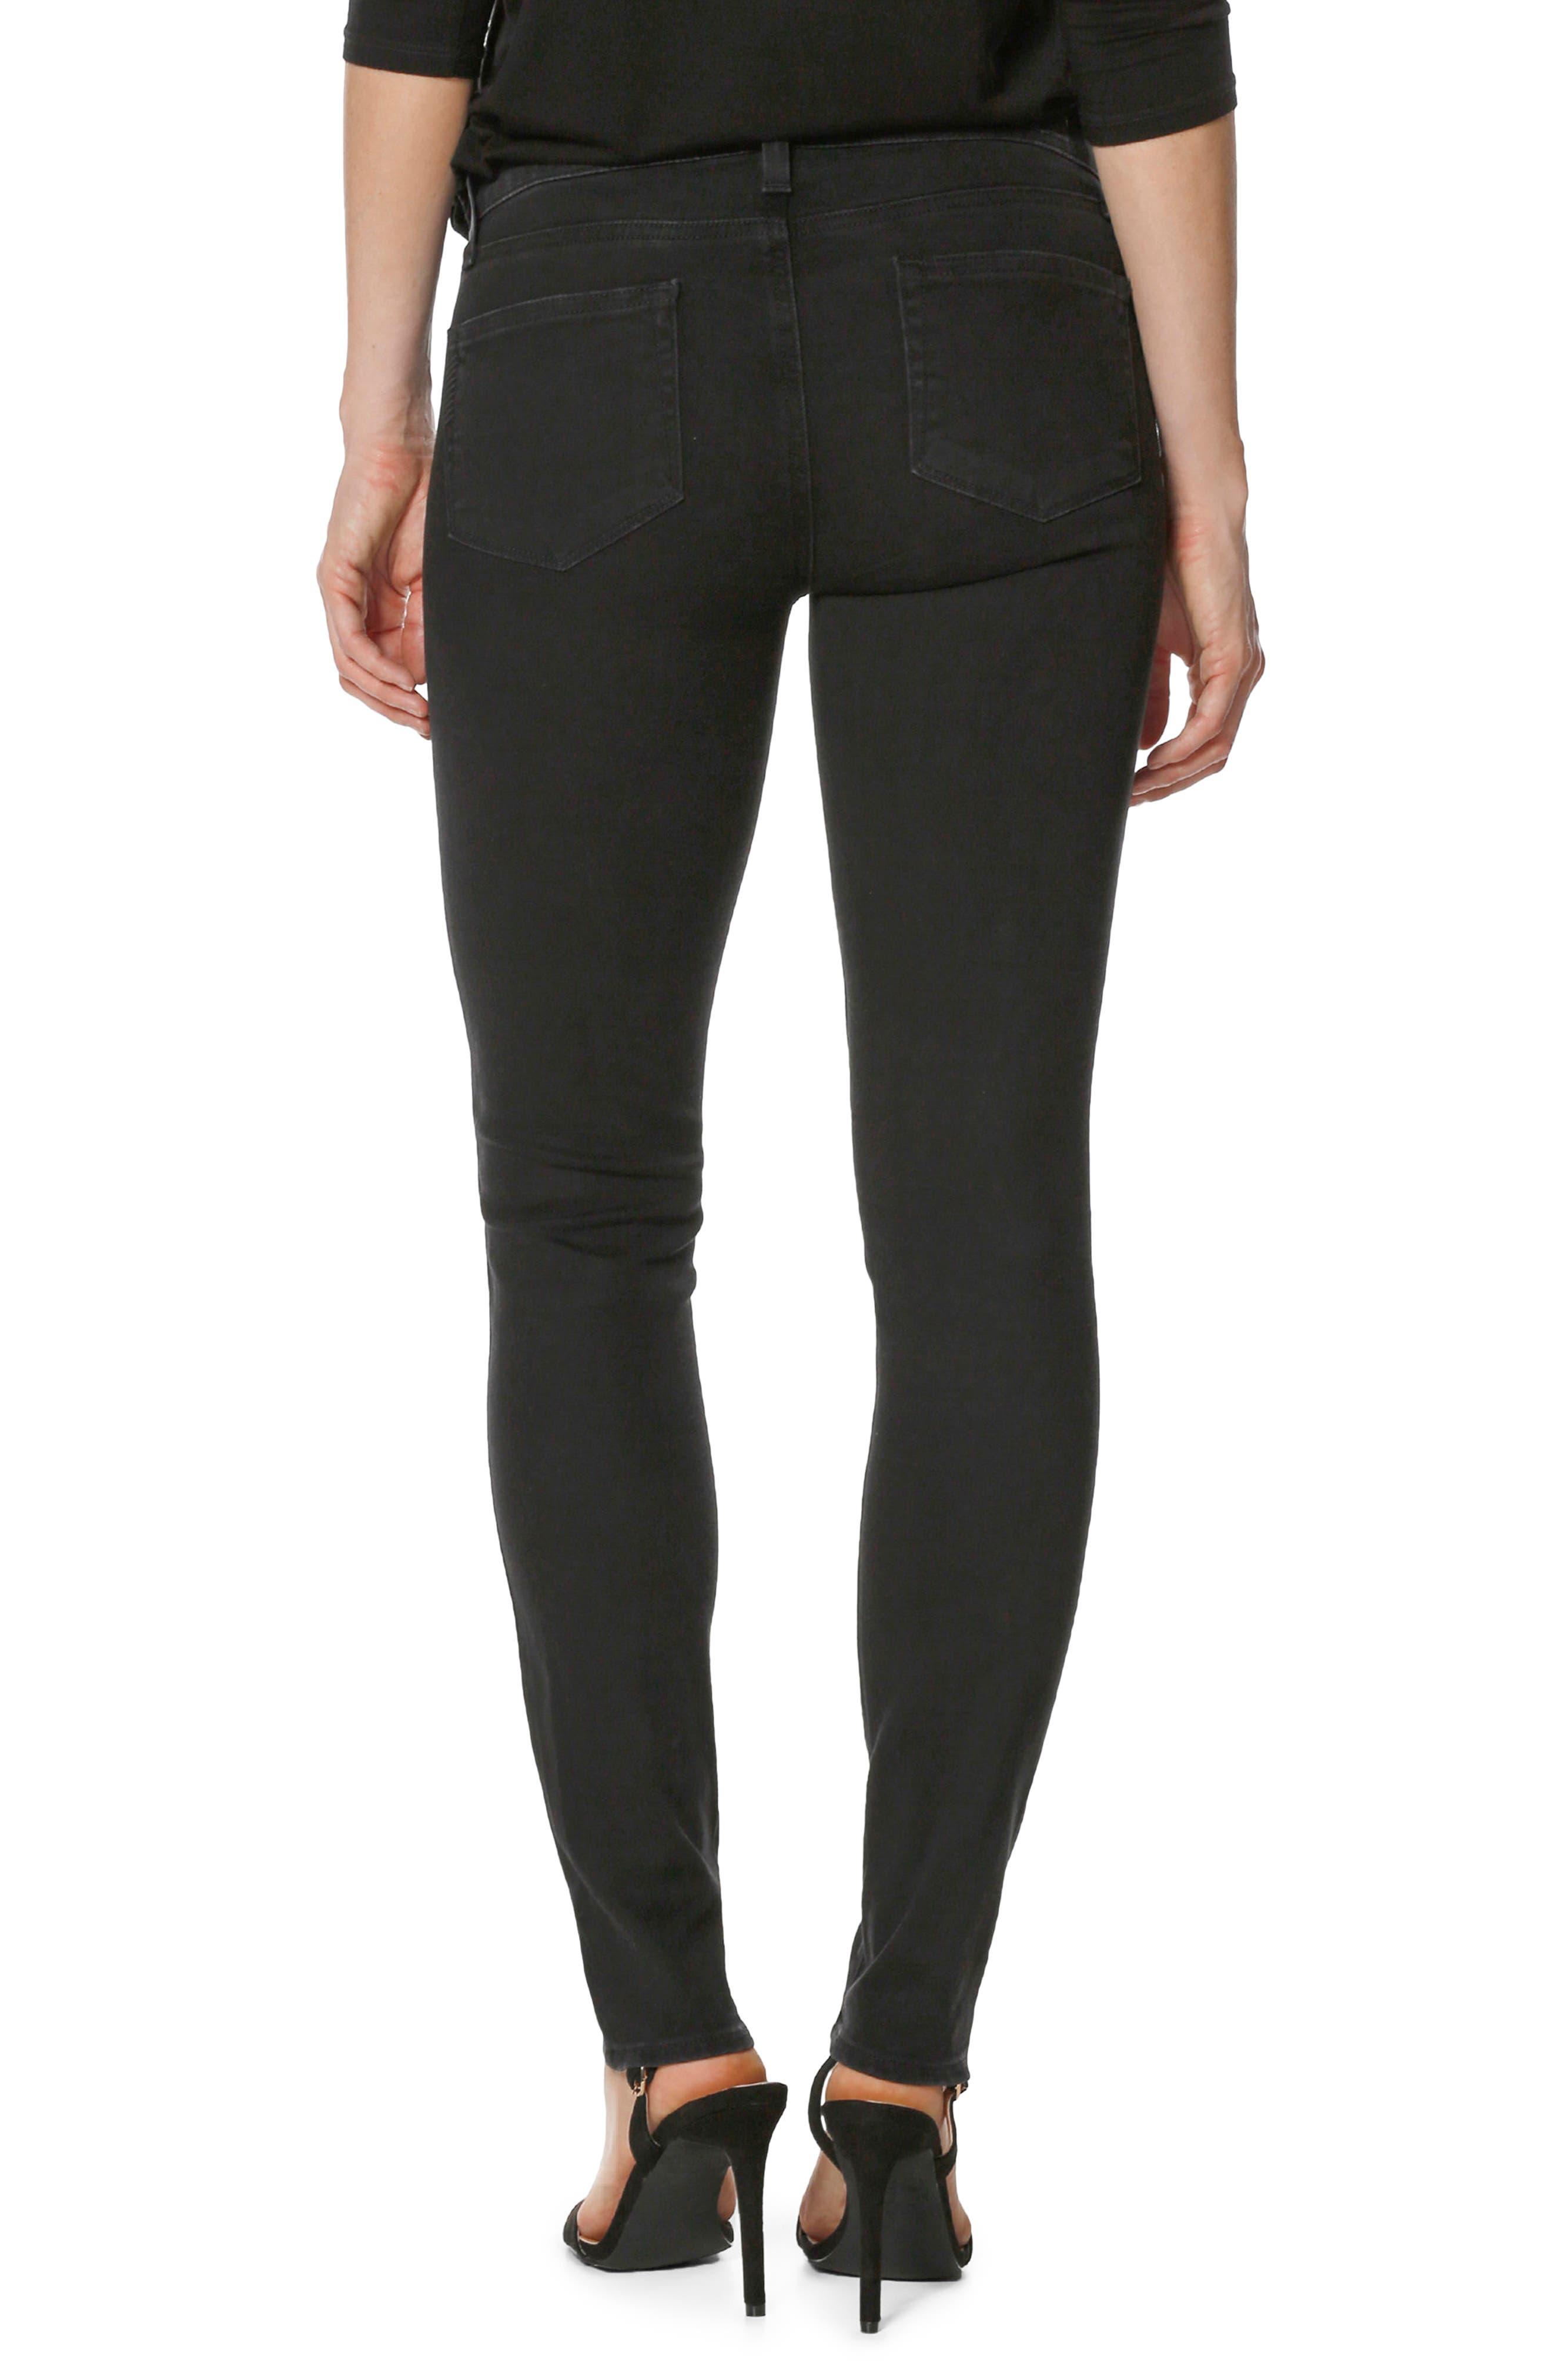 Verdugo Crystal Ultra Skinny Jeans,                             Alternate thumbnail 3, color,                             Noir Krystal